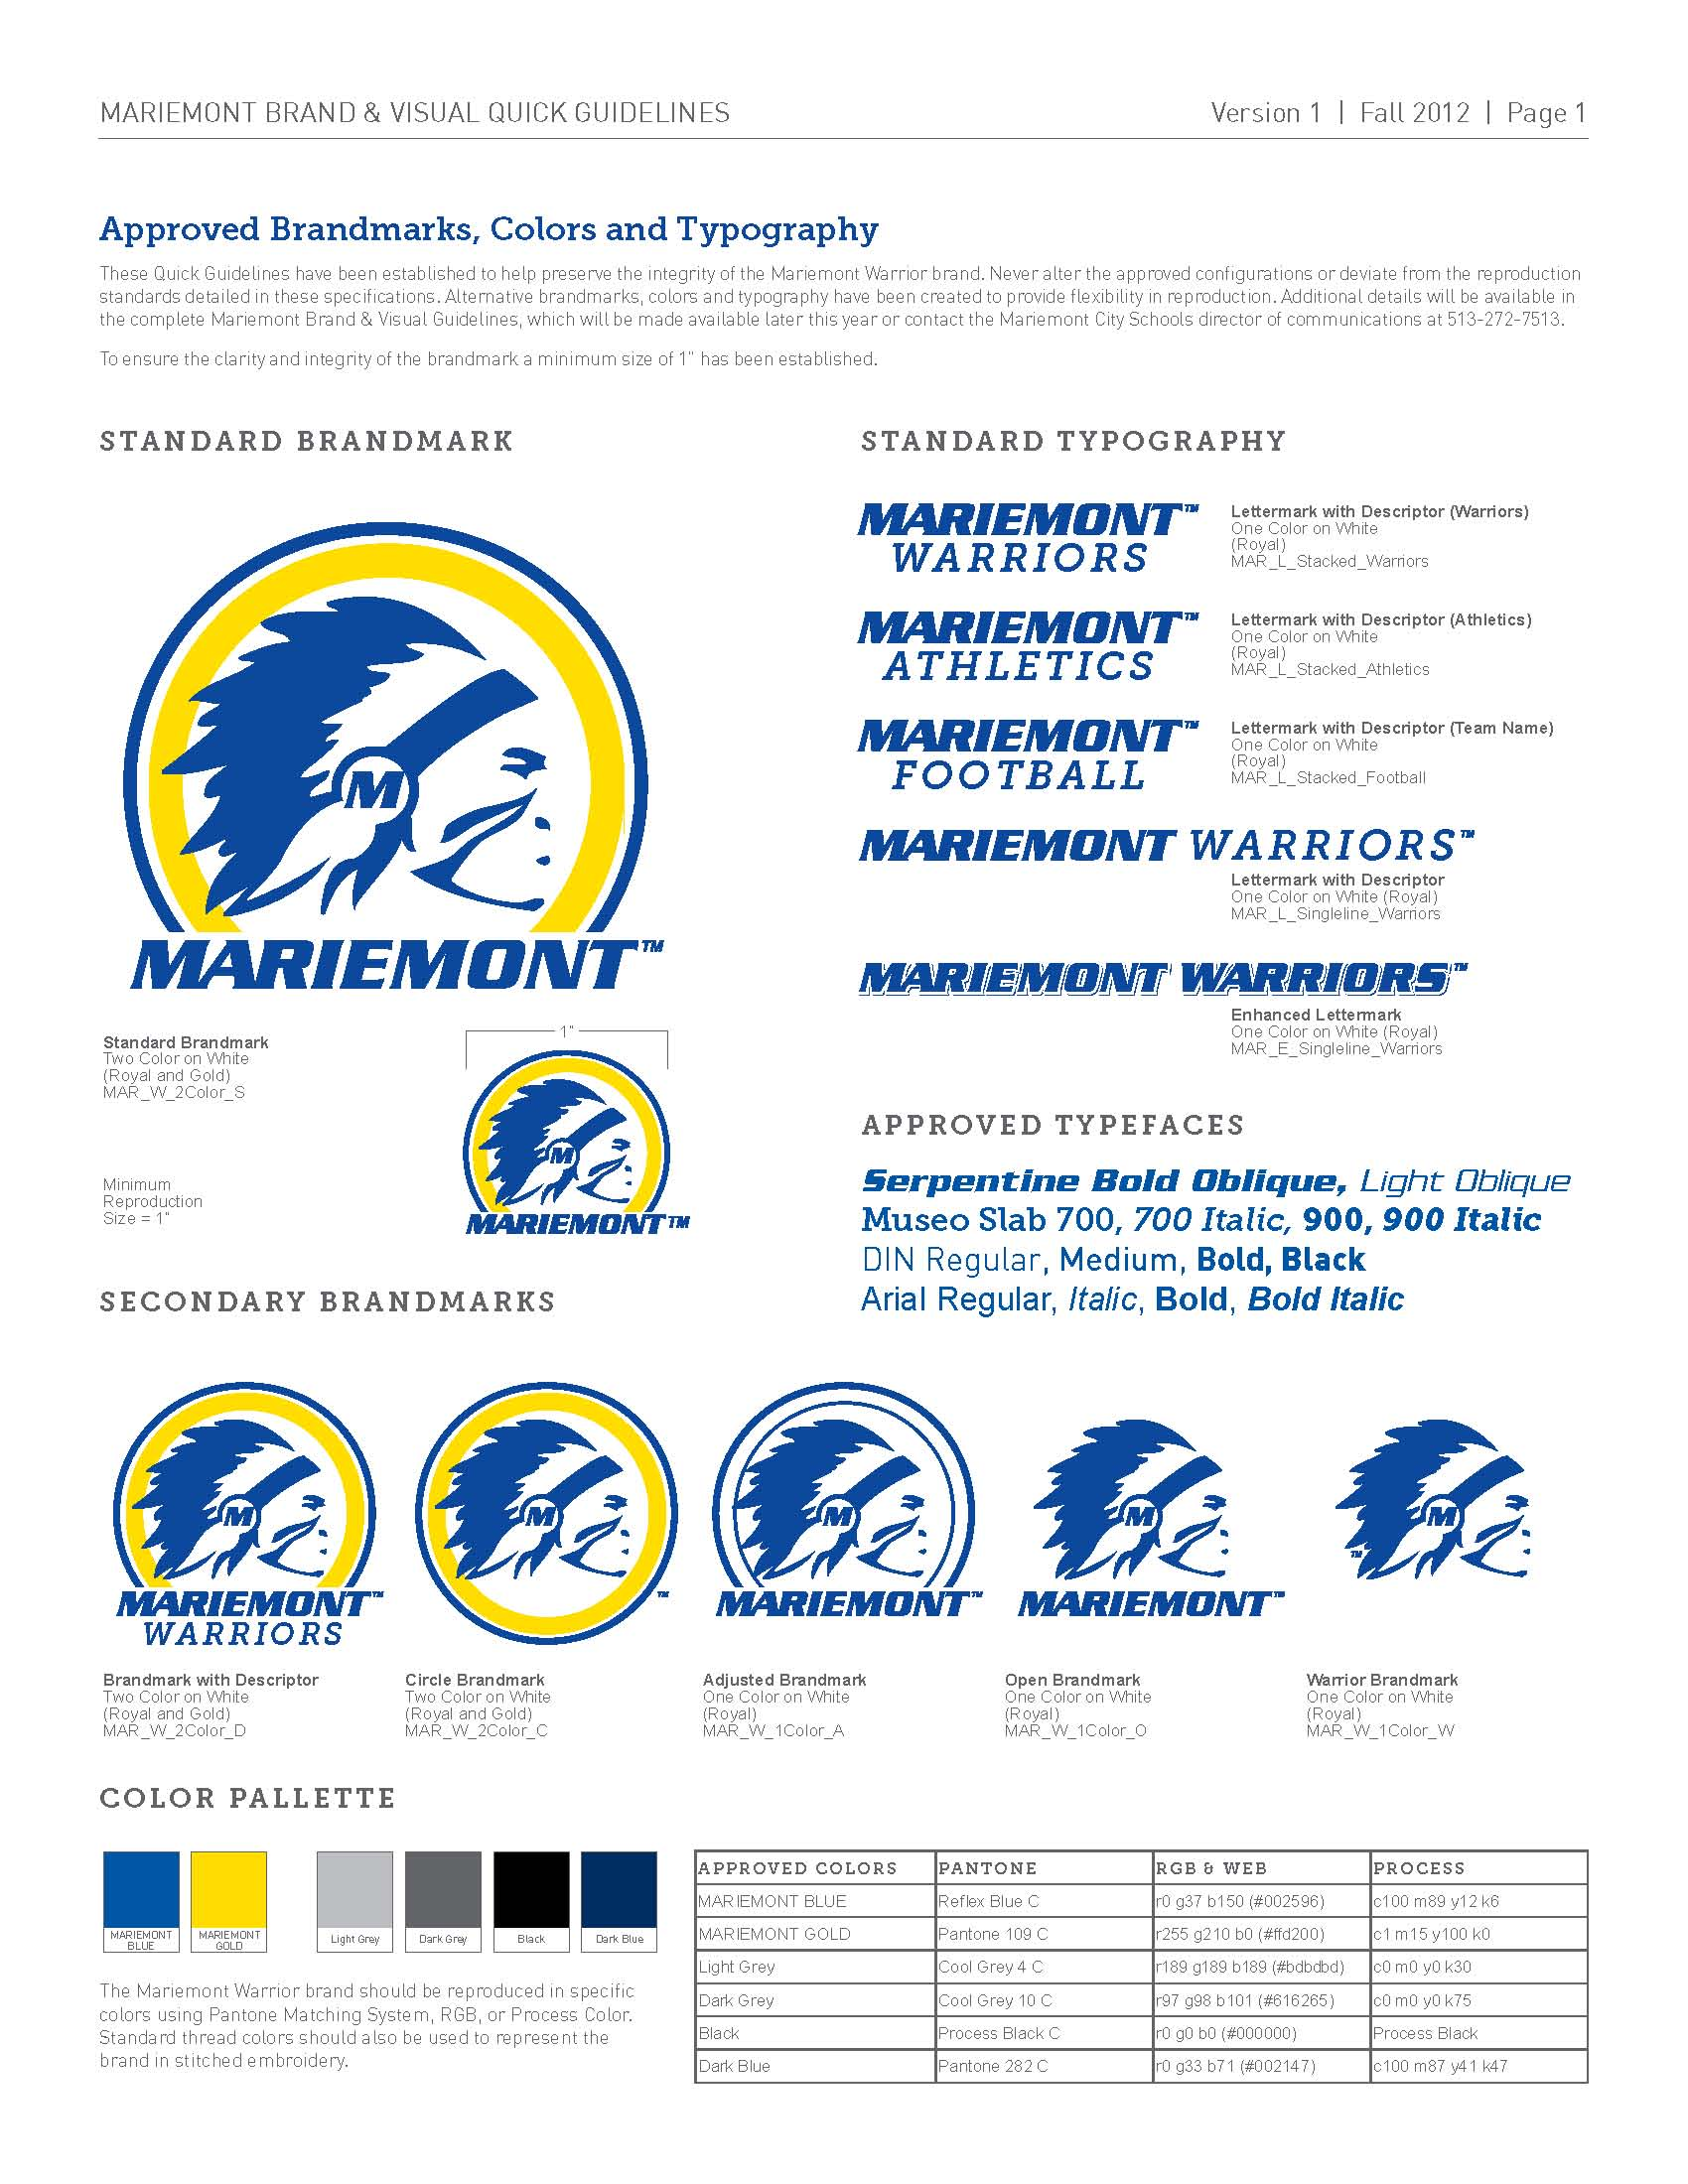 MAR_BrandGuidelines_v1_Fall2012_Page_1